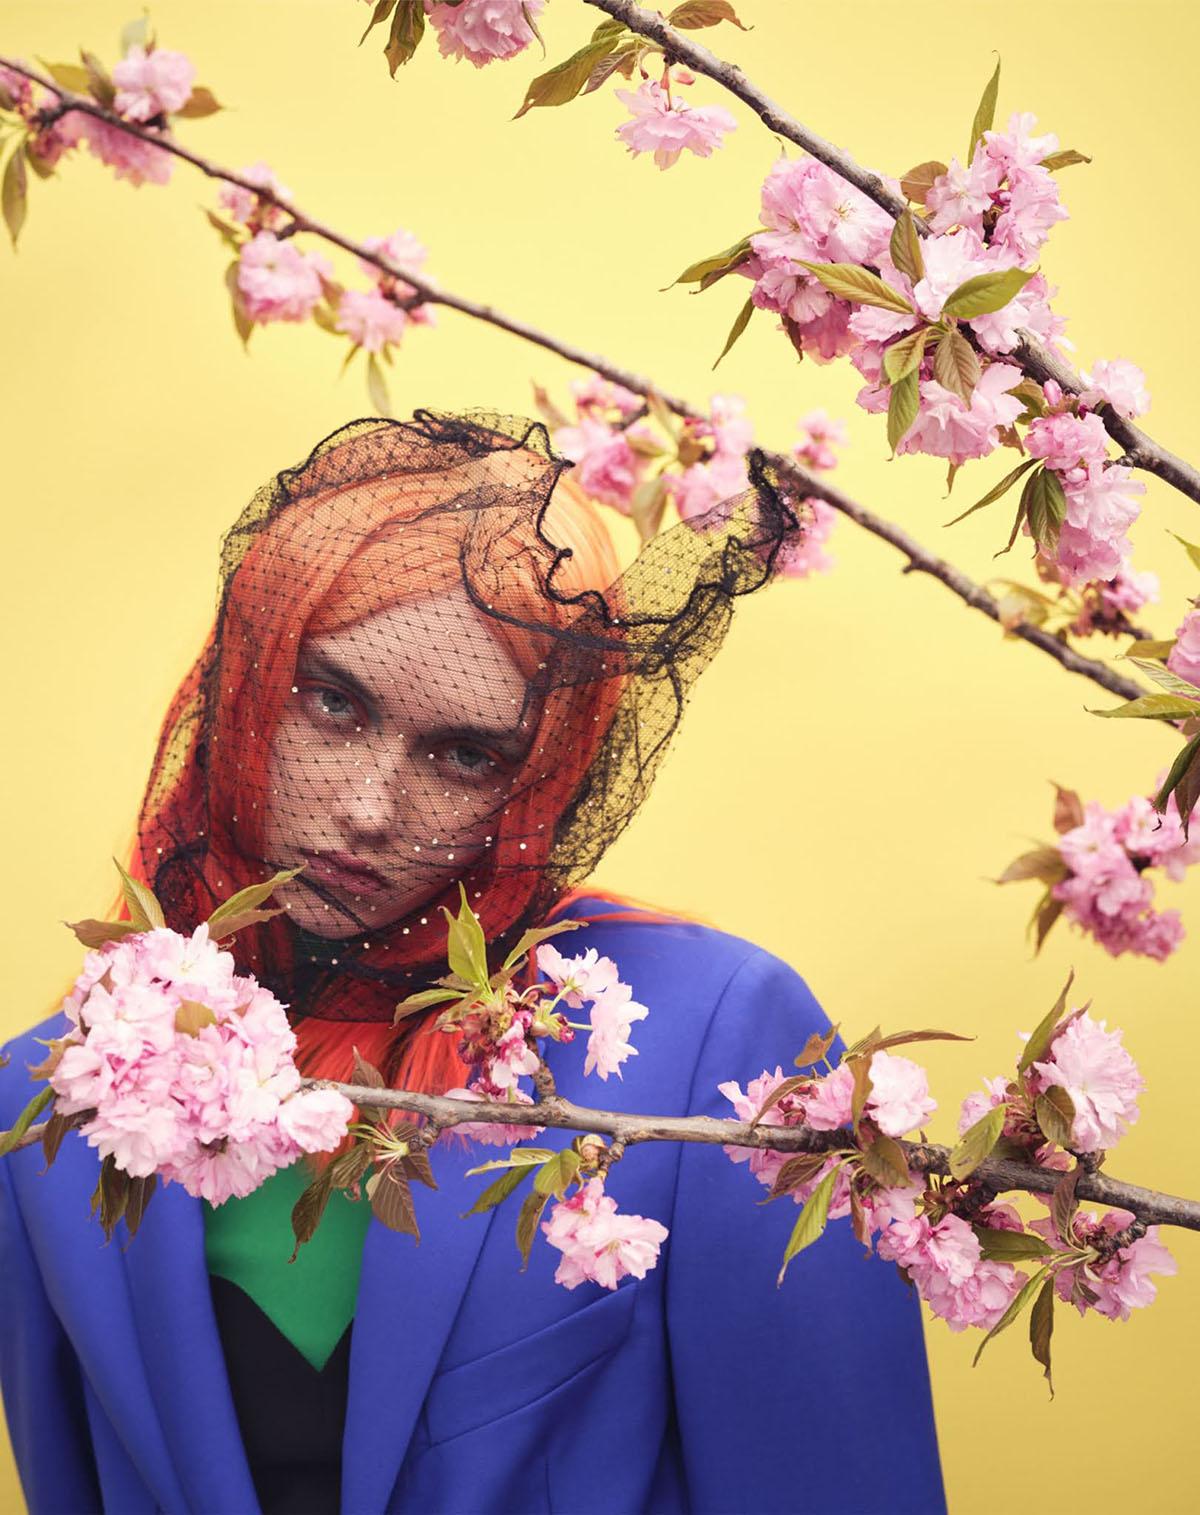 Sofia Steinberg by Nathaniel Goldberg for Vogue Japan July 2021